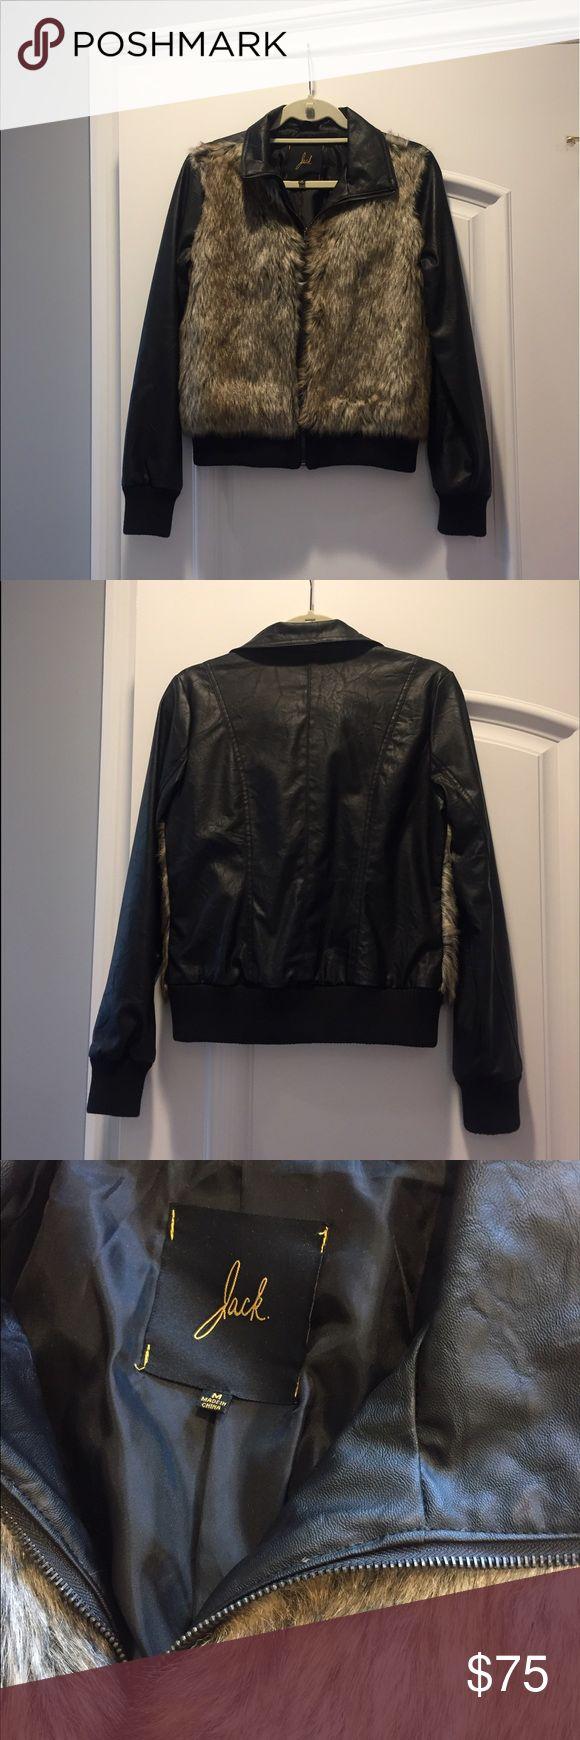 Jack by BB Dakota Faux Leather Faux Fur Jacket Trendy Faux Leather and Faux Fur jacket. Great with jeans or over a dress. Only worn twice ! Jack by BB Dakota Jackets & Coats